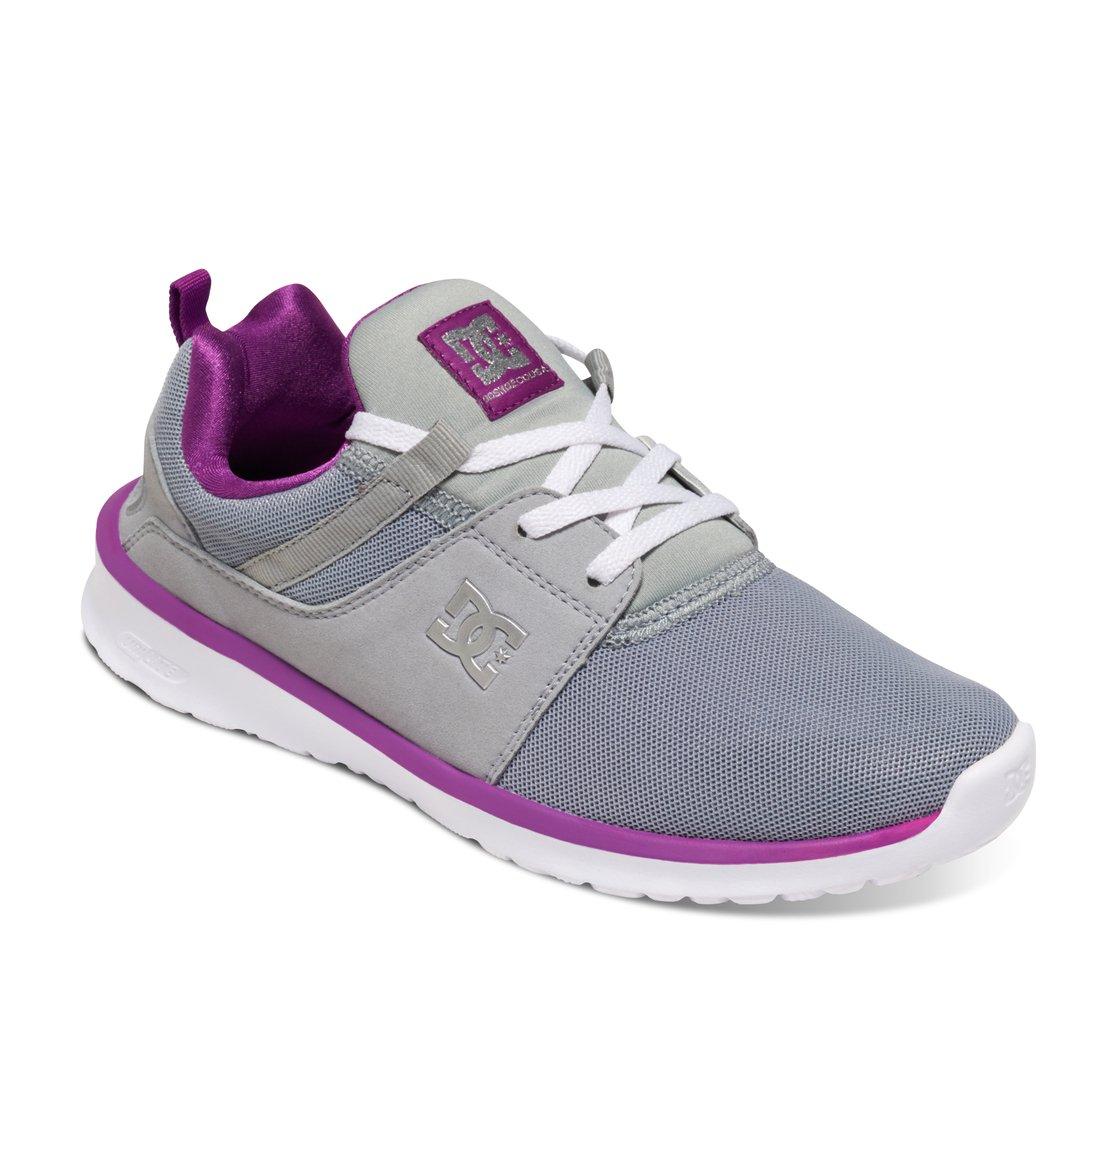 heathrow shoes 888327502786 dc shoes. Black Bedroom Furniture Sets. Home Design Ideas